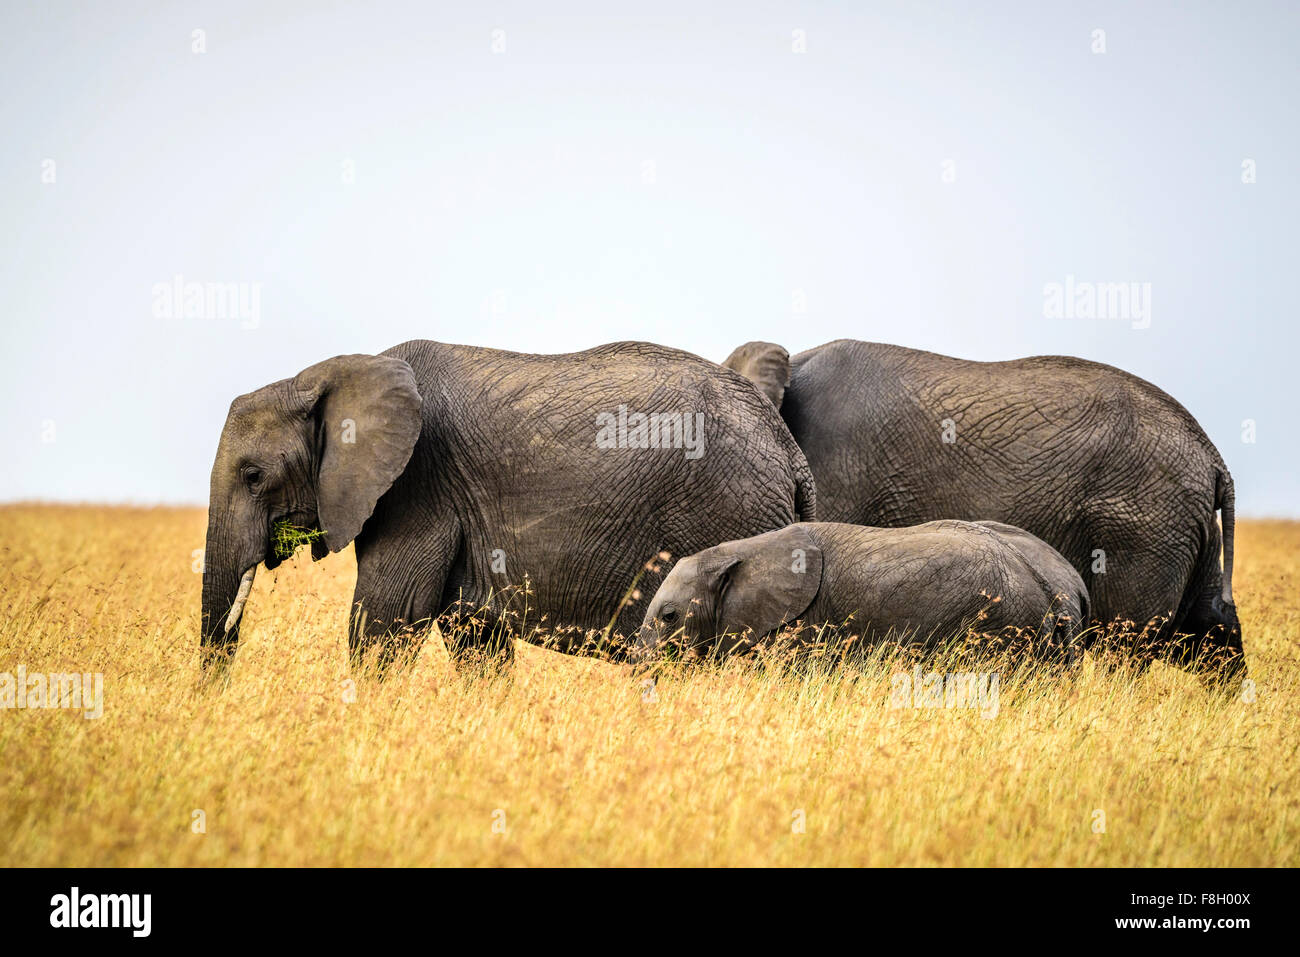 Elefanten und Kalb in Savanne wandern Stockbild